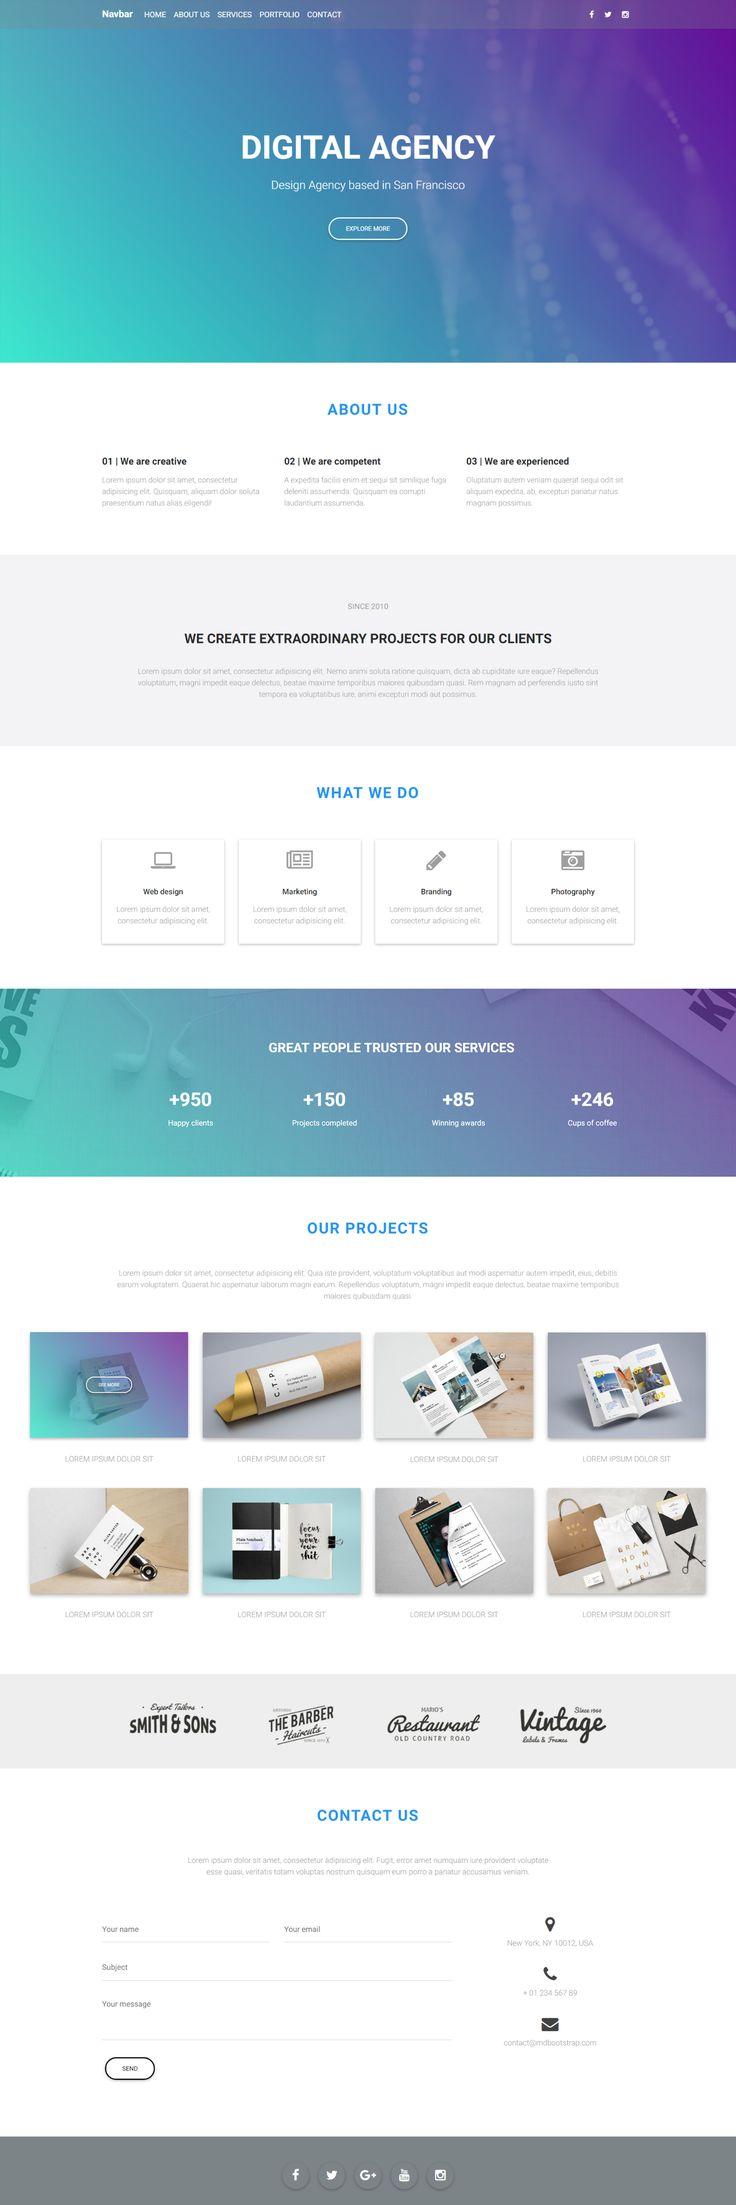 Material Design Digital Agency protfolio created with MDB UI kit.